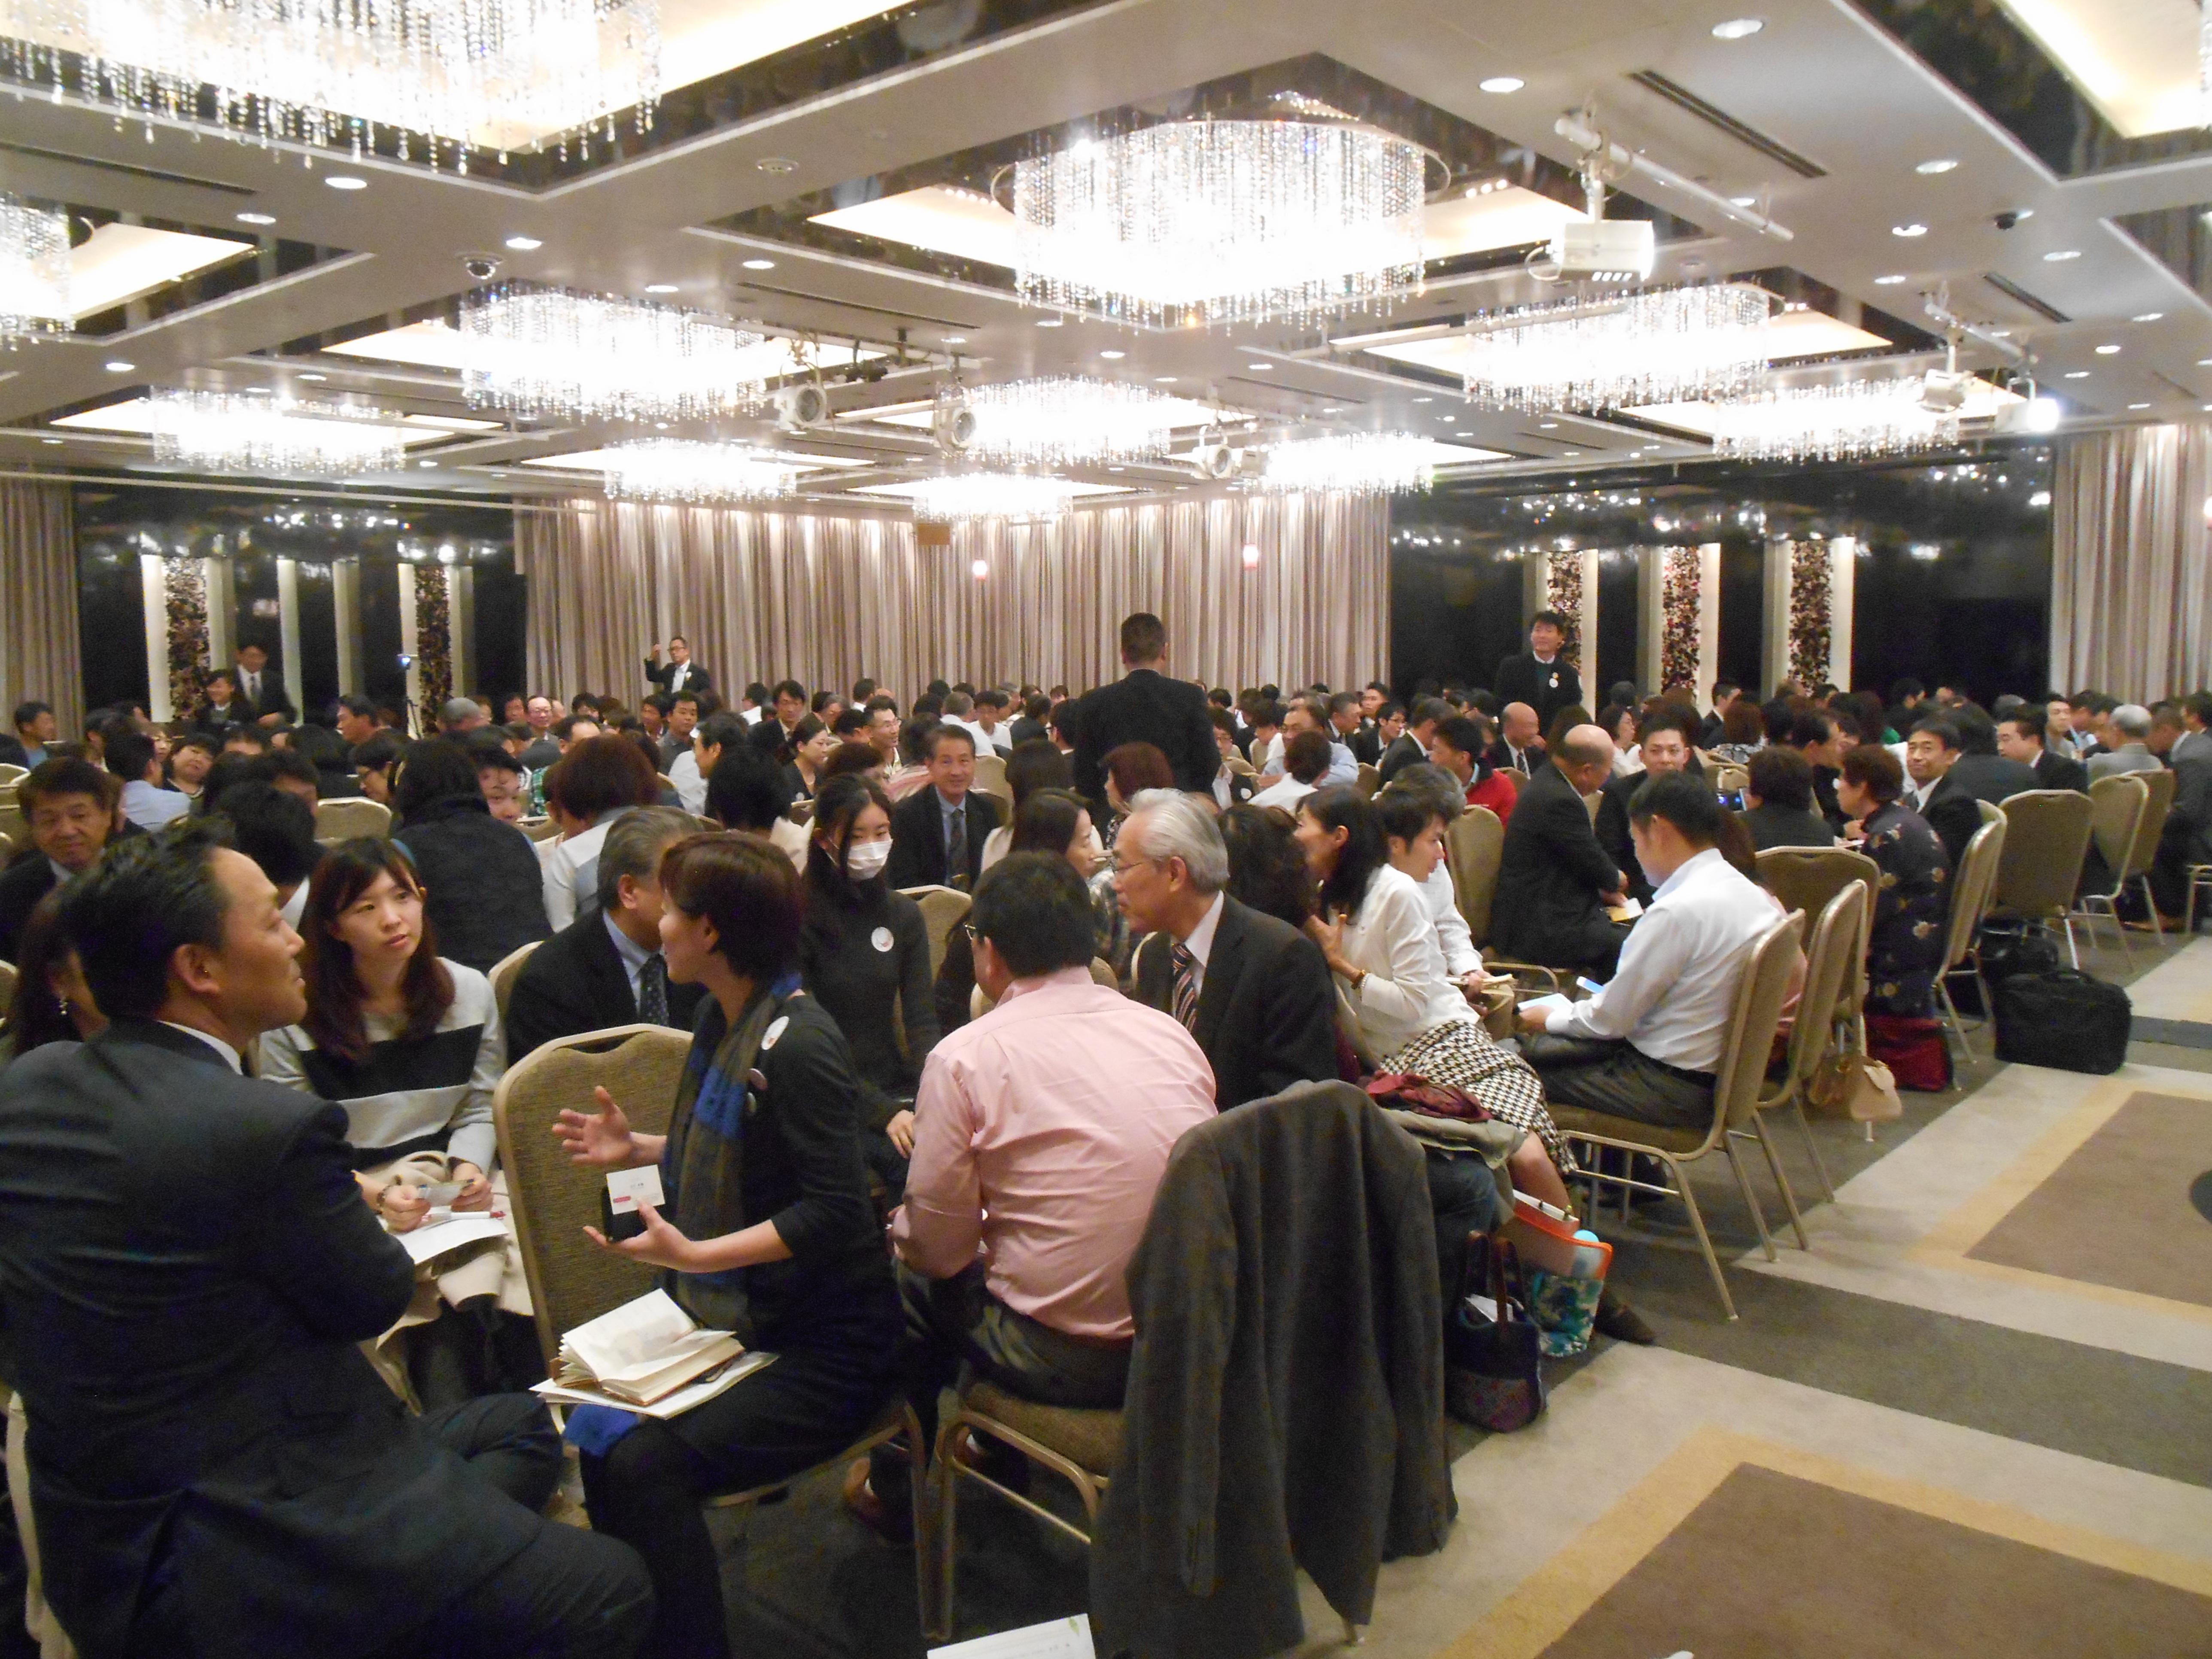 DSCN2093 - 平成30年度 東京思風塾 4月7日(土)「時代が問題をつくり、問題が人物をつくる」